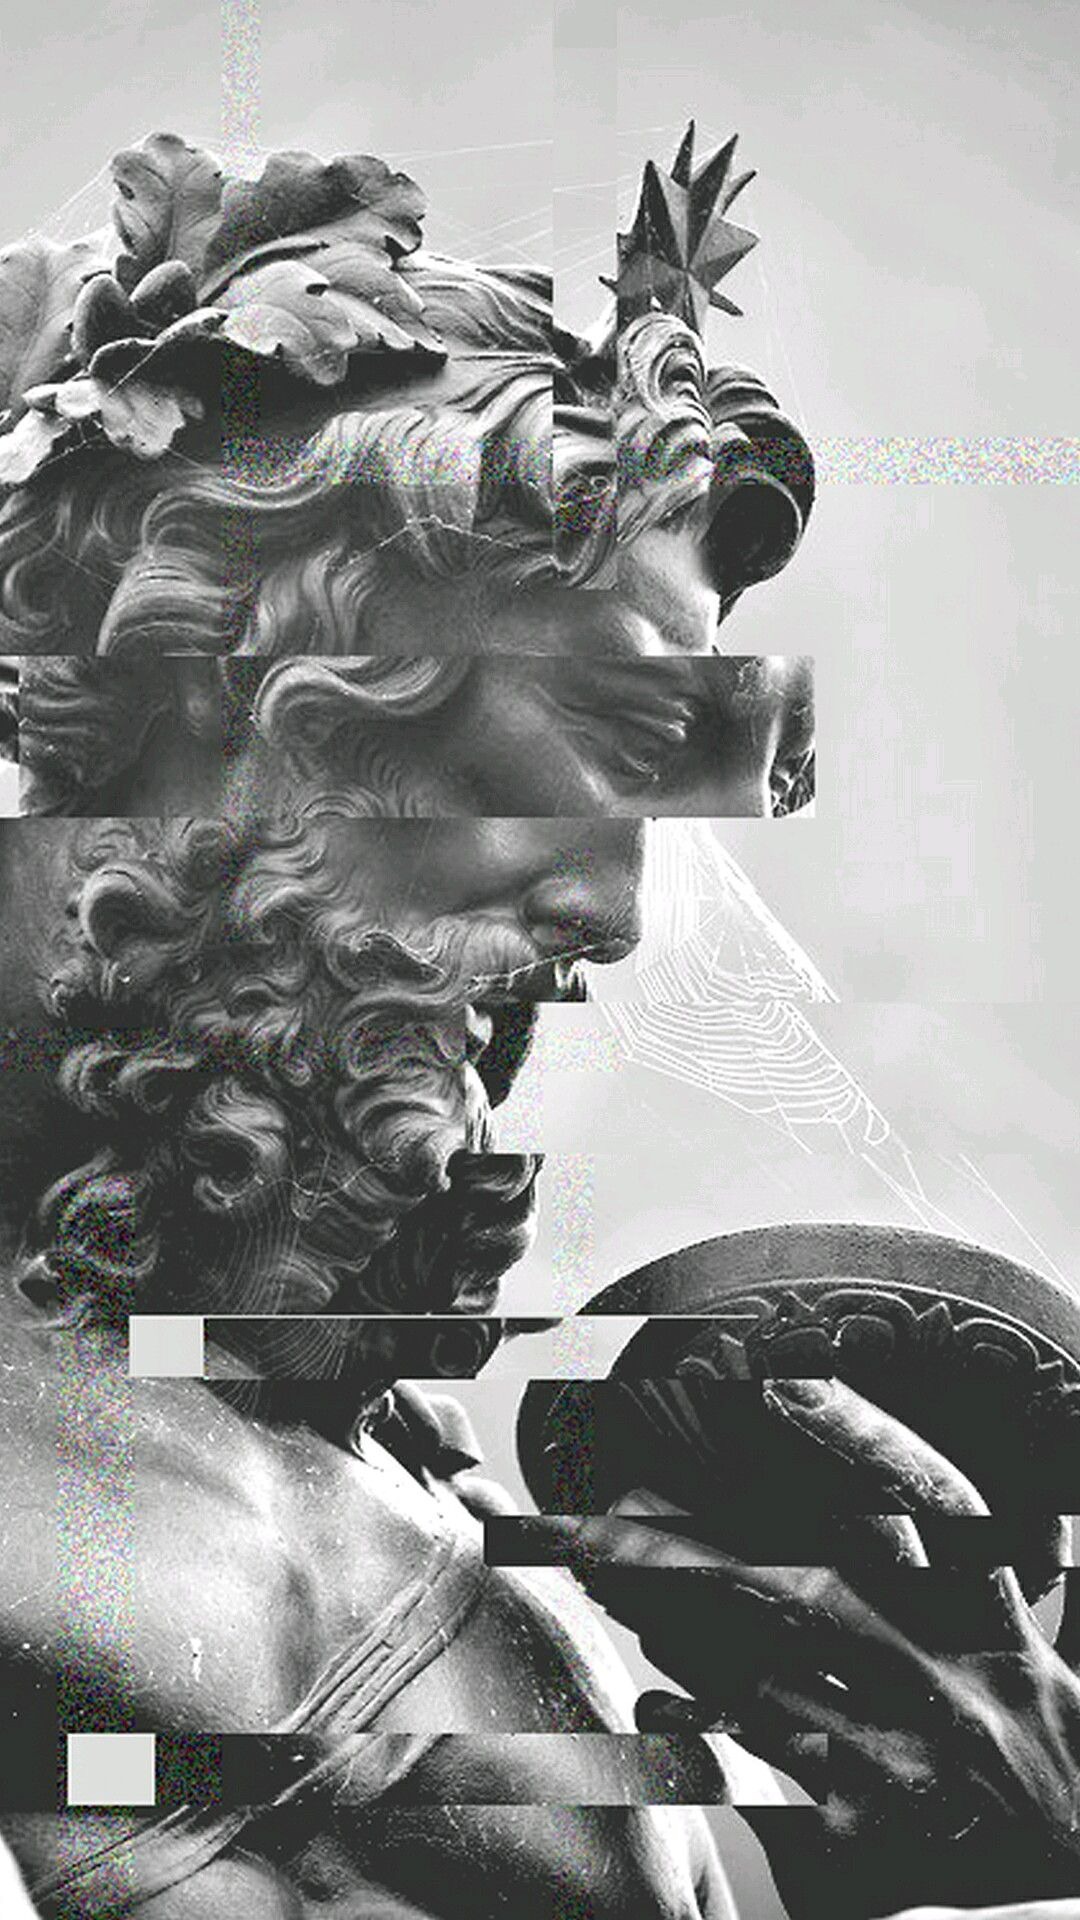 pinlegacyynl 22 on art in 2018 | pinterest